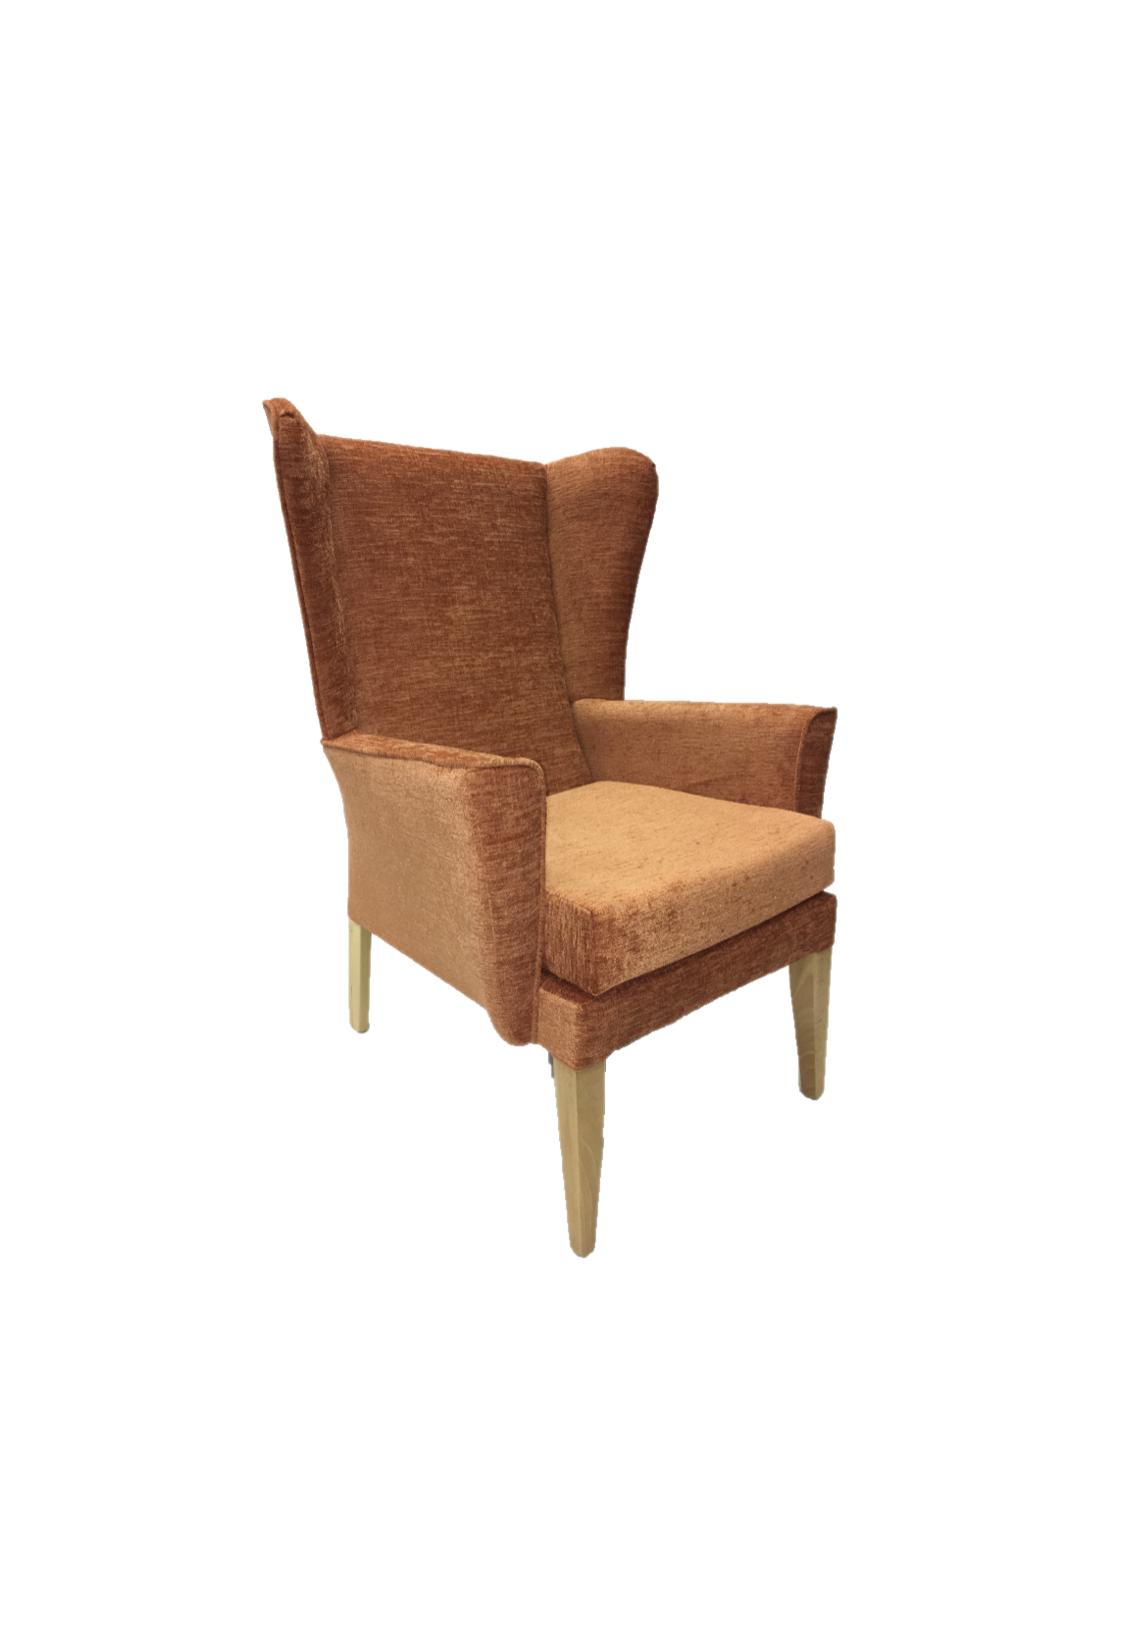 Cavendish Furniture Mobilityacaster Orthopaedic Chair In